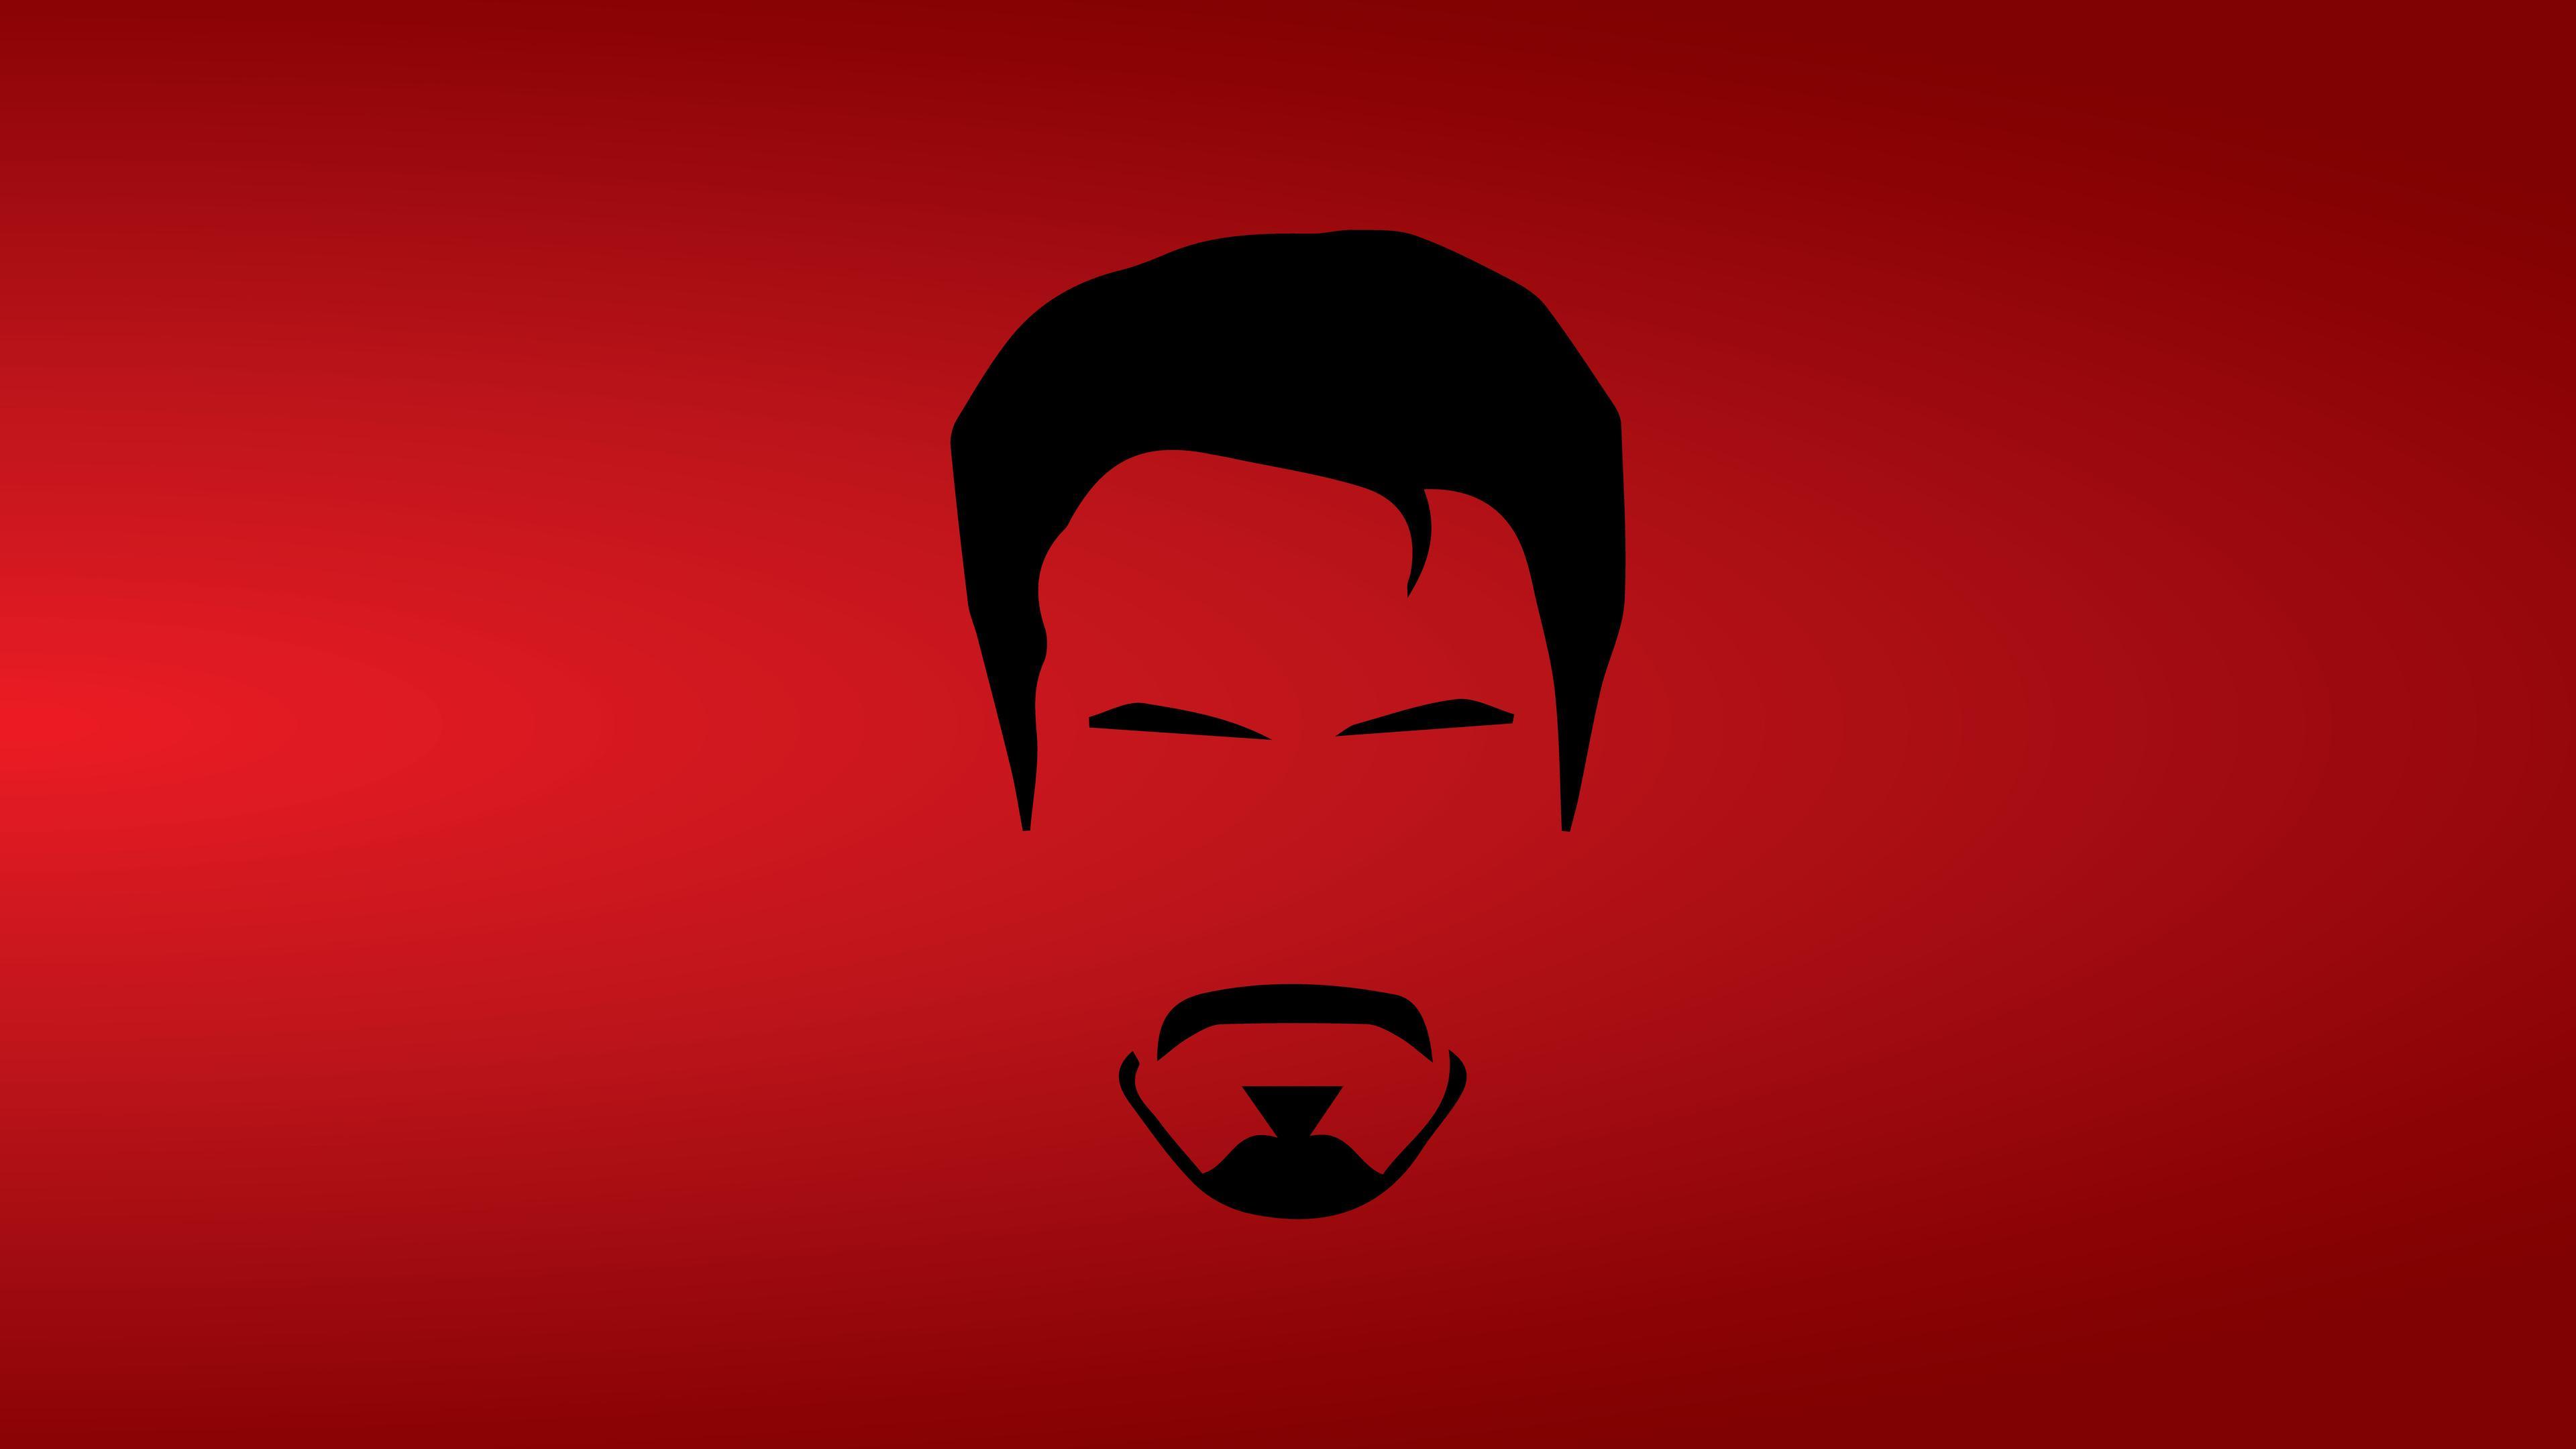 Tony Stark Endgame Wallpapers Wallpaper Cave